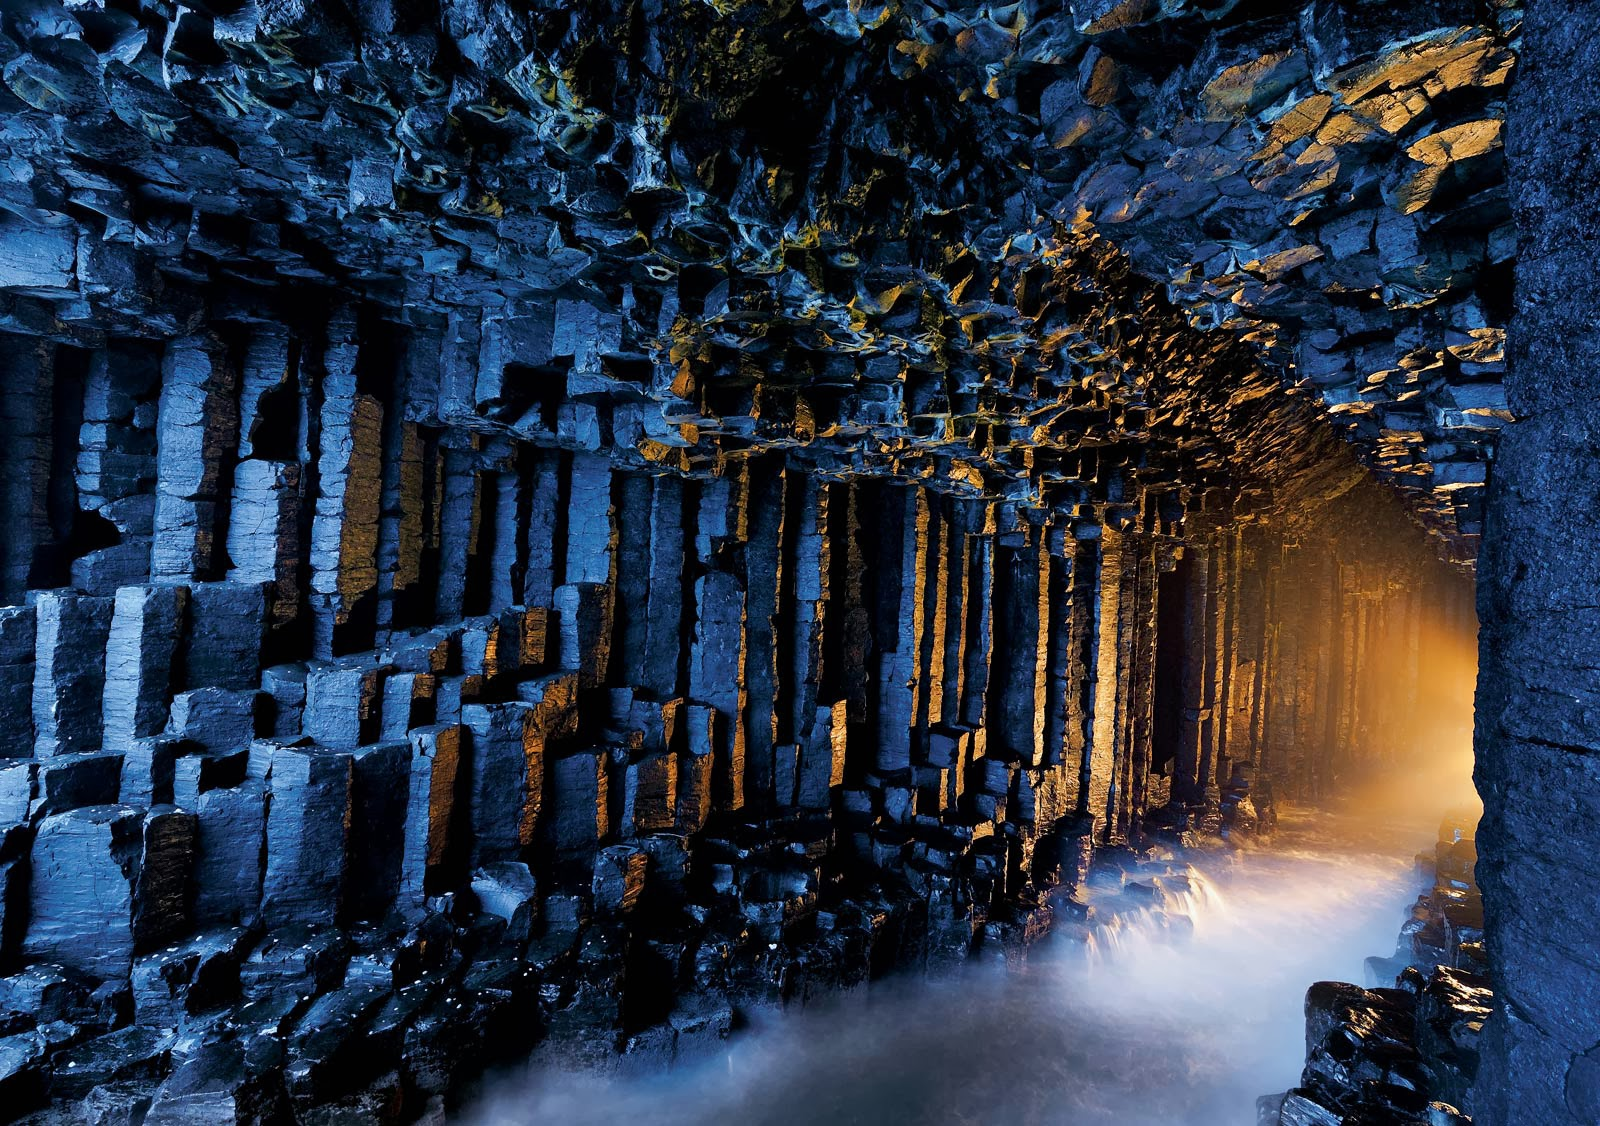 Fingals Cave Scotland HD Wallpapers   Top HD Wallpapers 1600x1126